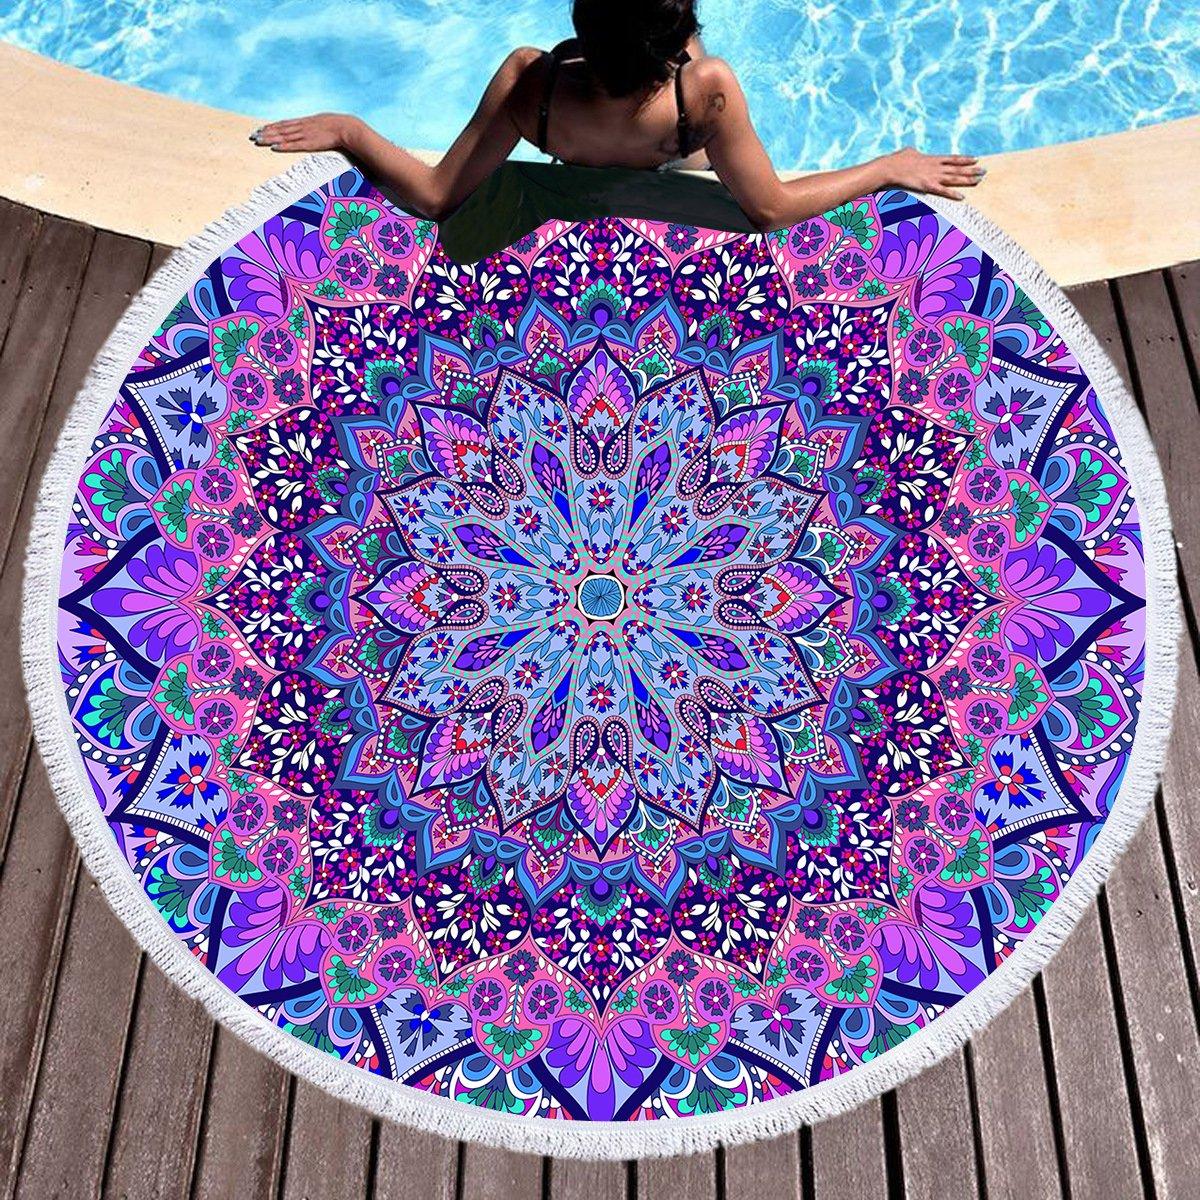 Sleepwish Ombre Beach Towel Indian Wall Hanging Beach Throw Tapestry Yoga Mat Mandala Large Round Beach Blanket with Tassels (Purple Blue, 60'')